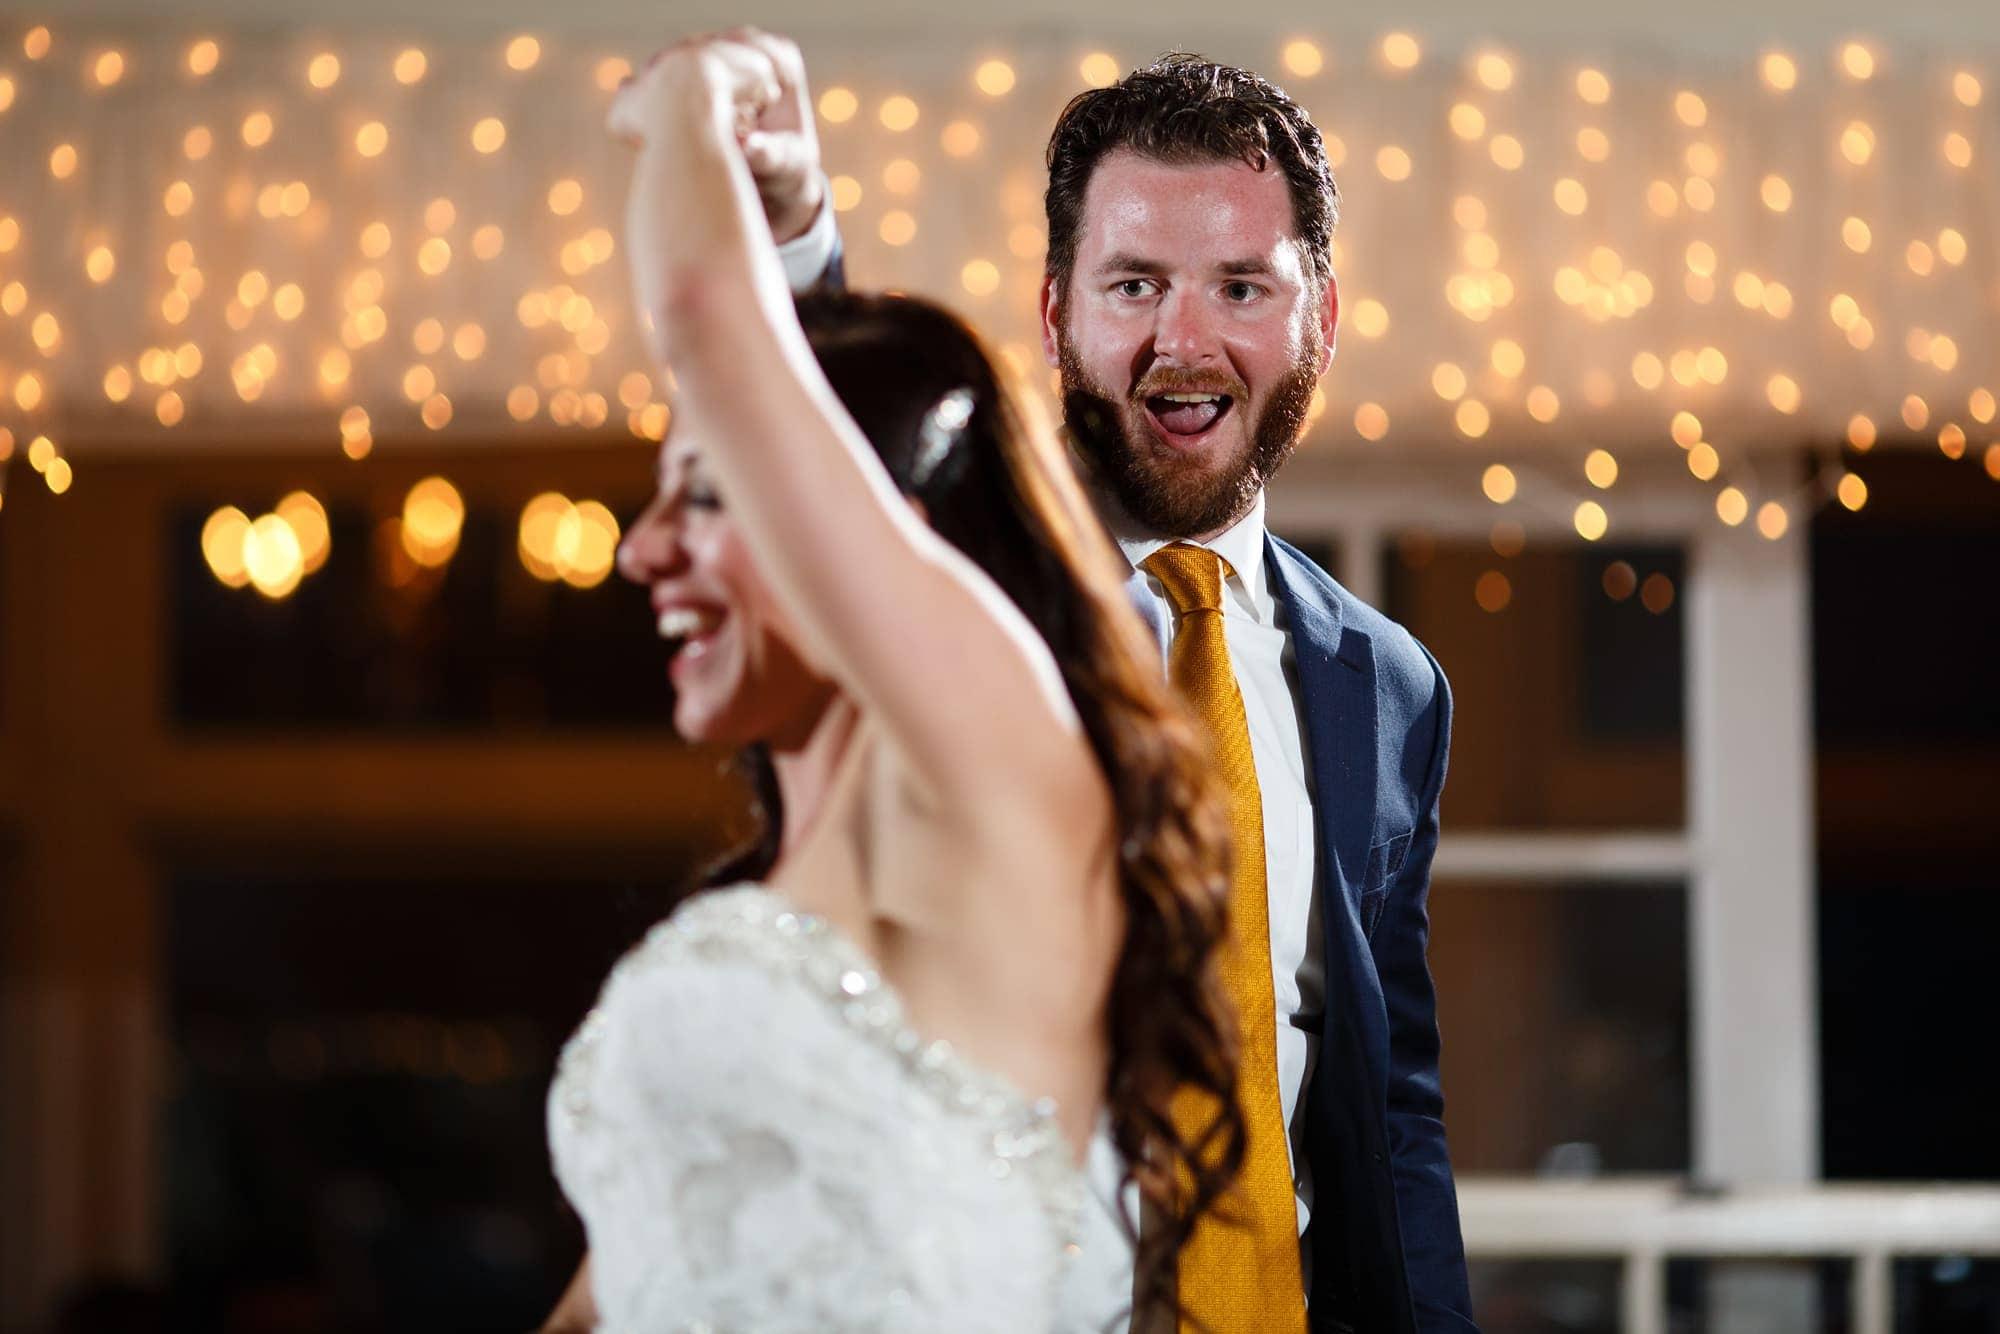 Blake spins gina during a dance at their Willow Ridge Manor wedding